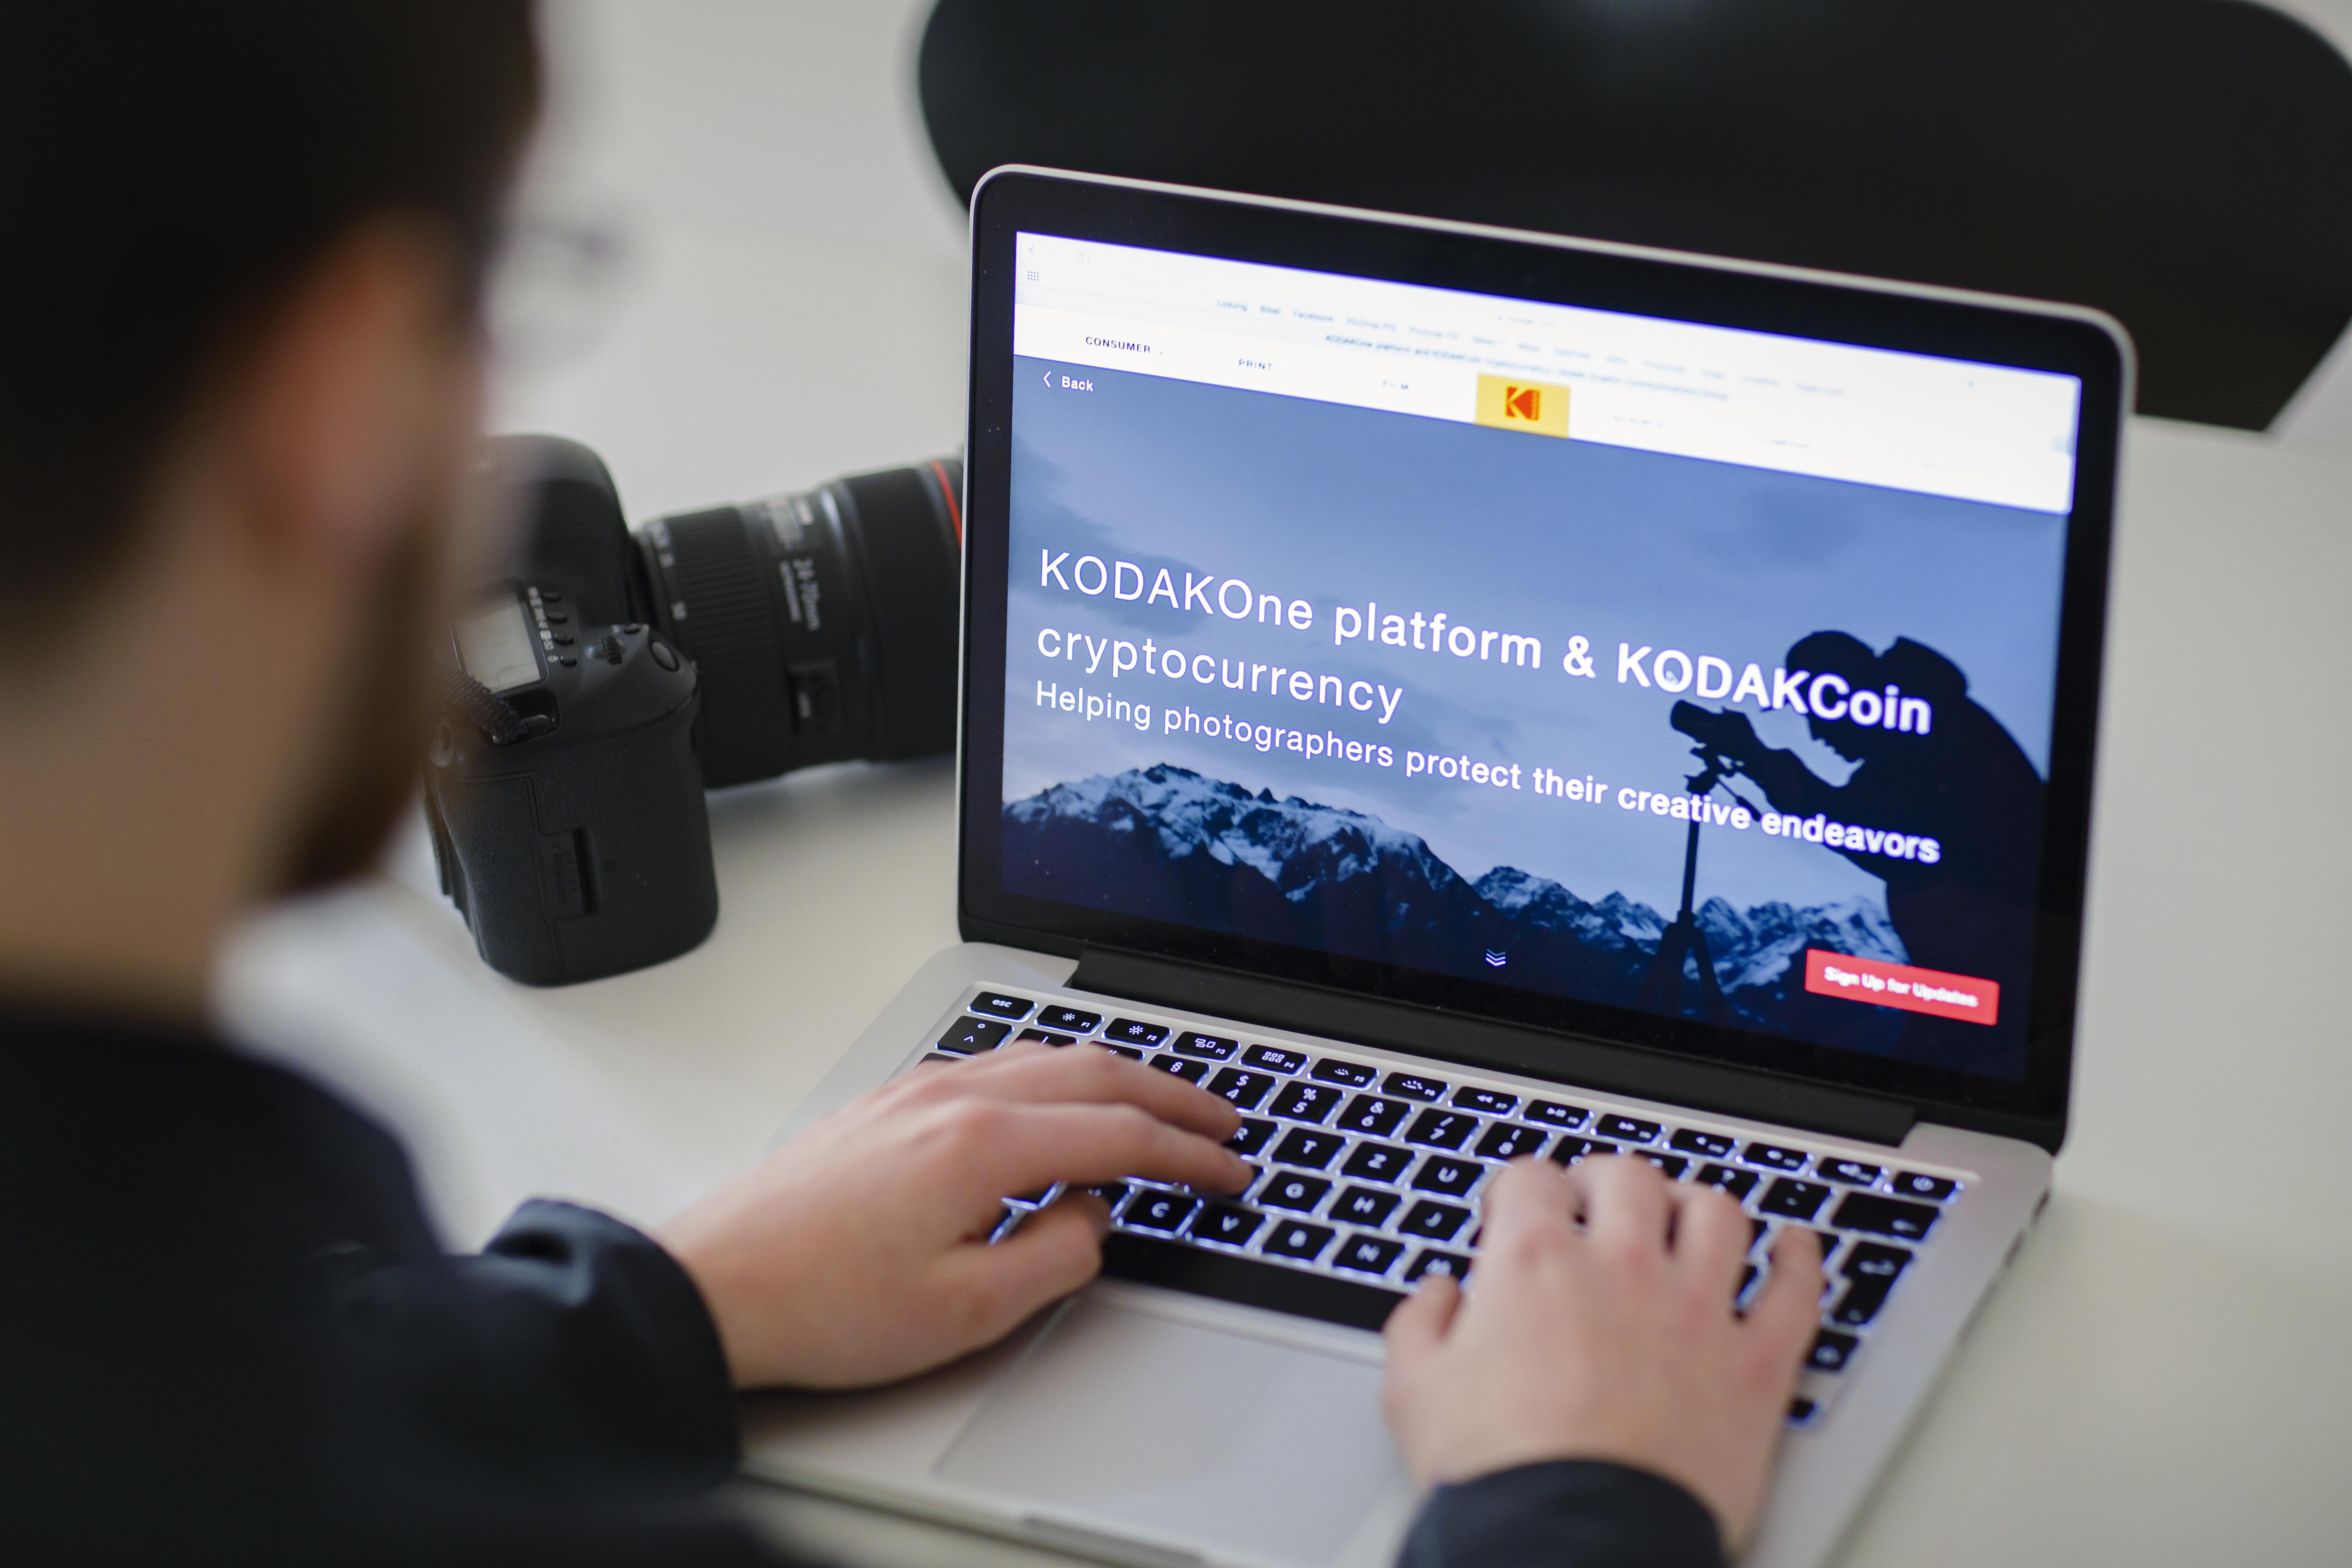 KODAK Launches Cryptocurrency KODAKCoin